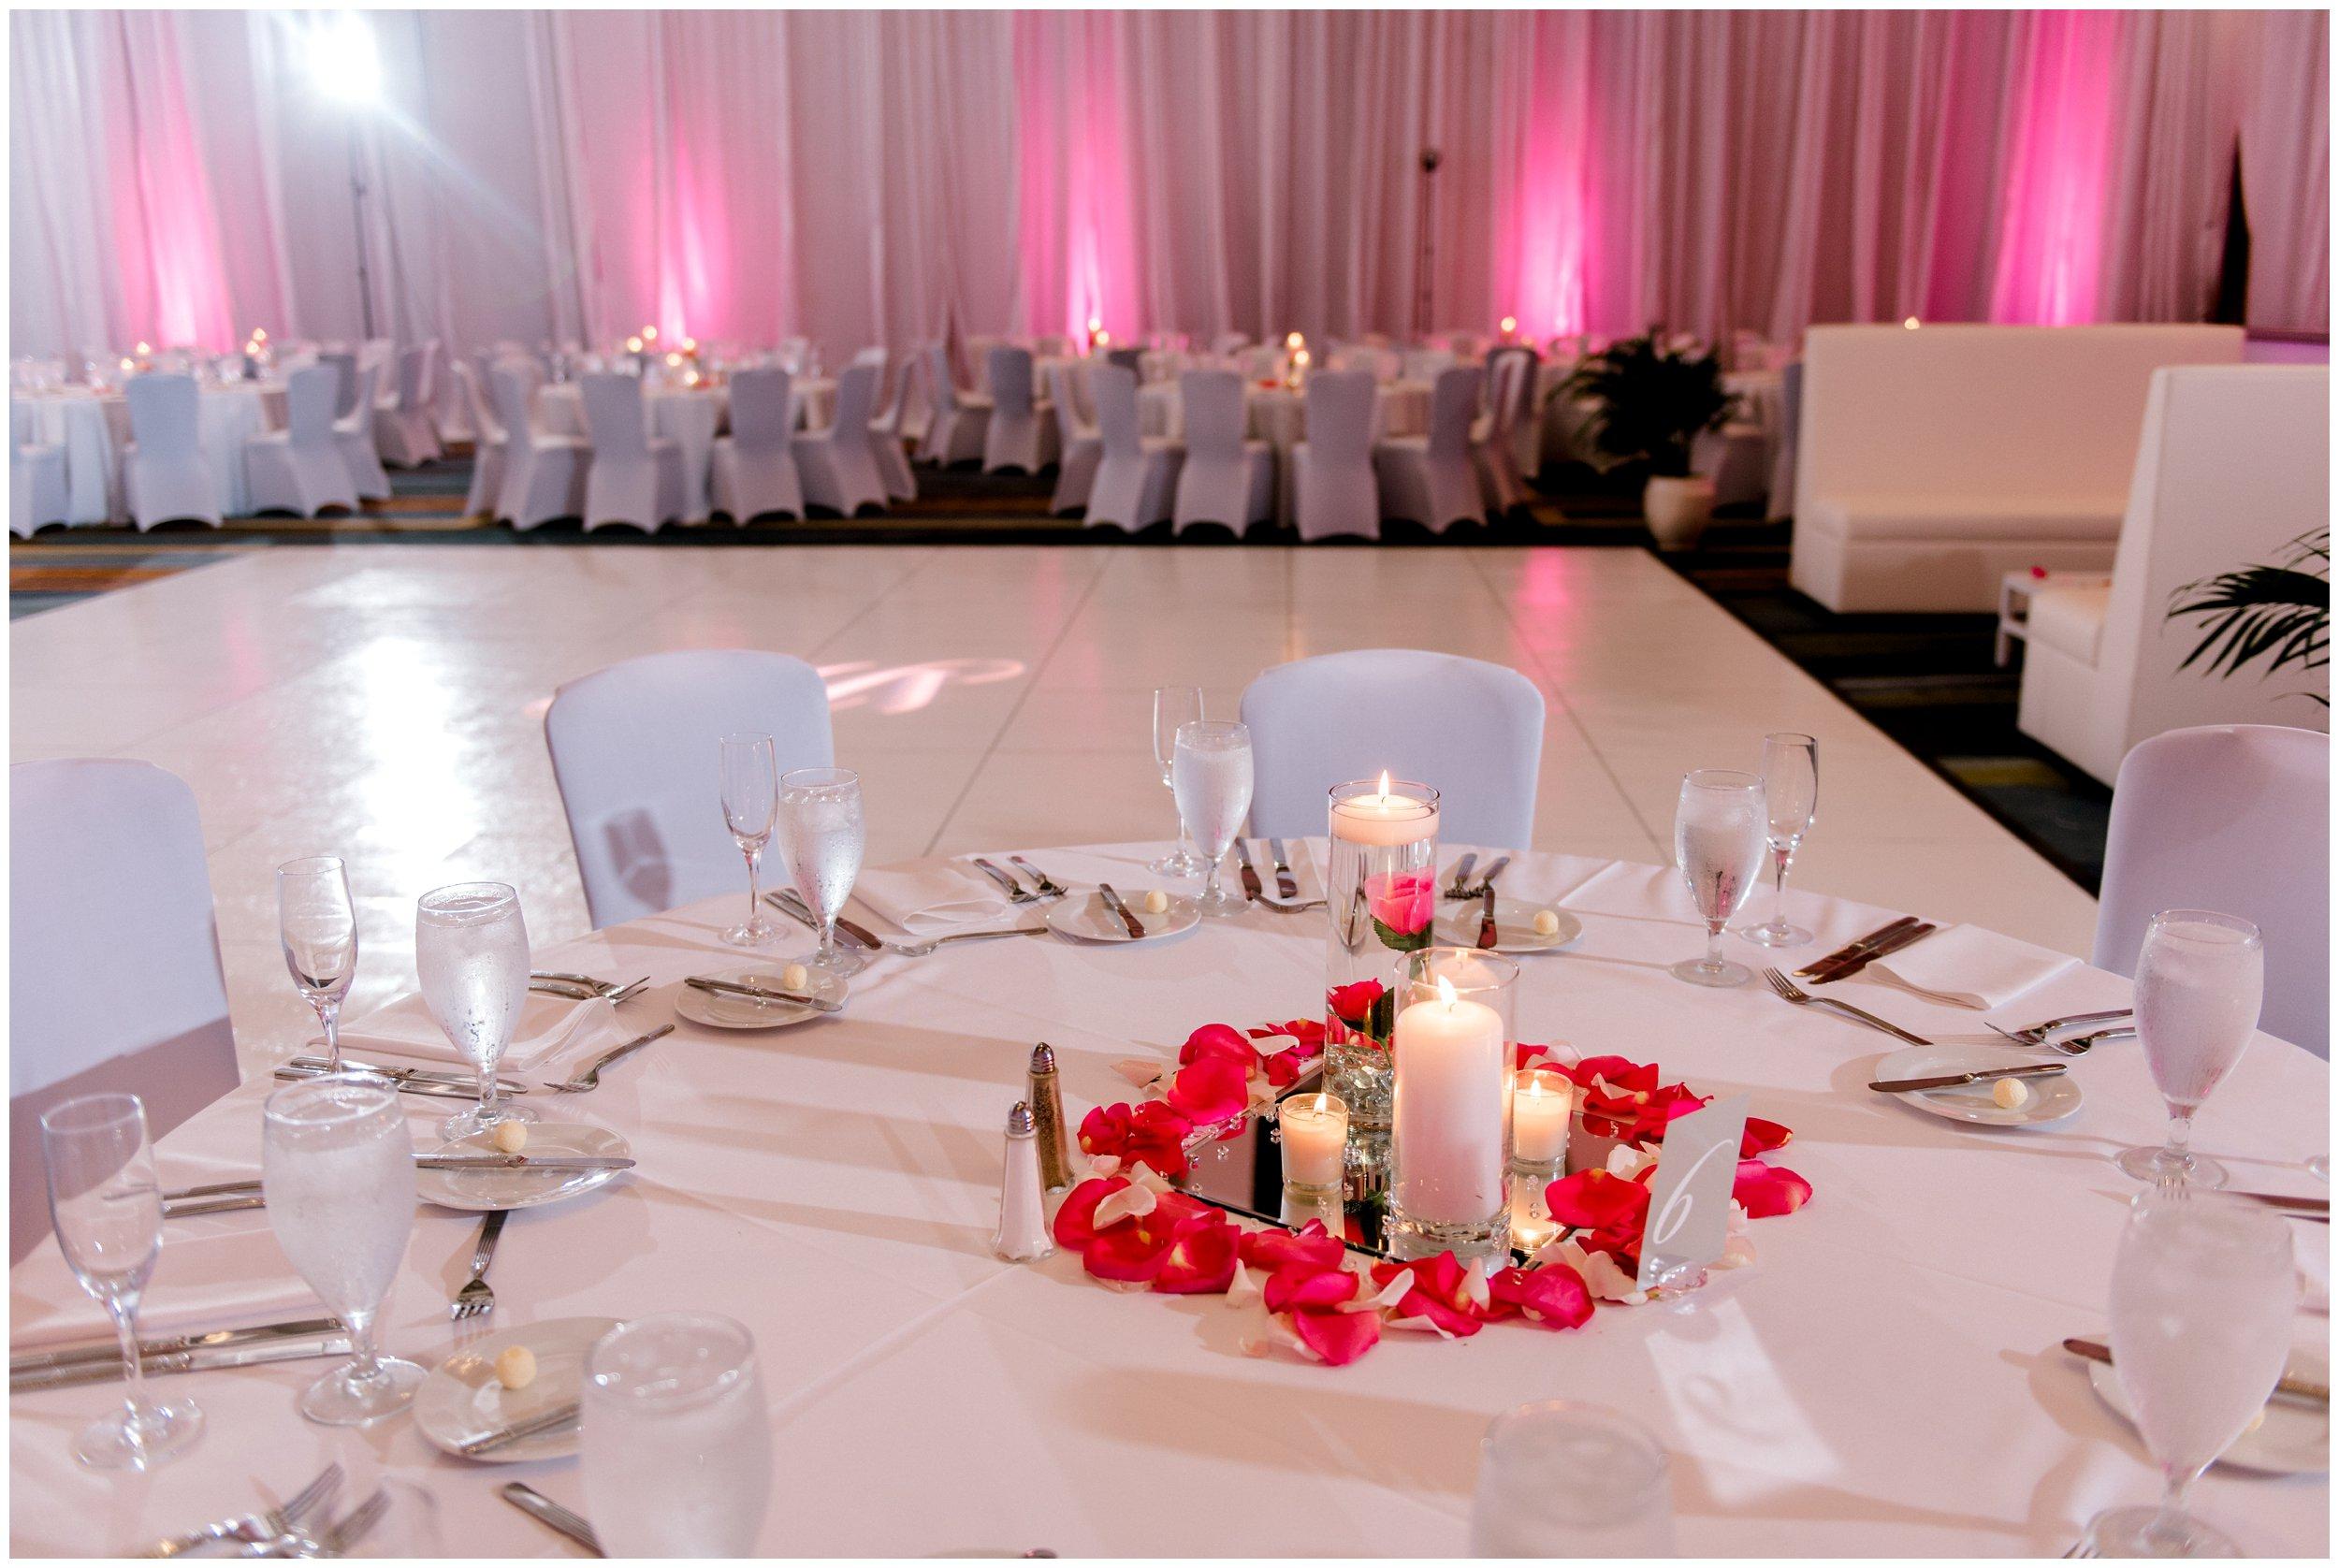 Hyatt Regency wedding venue, pink and white details